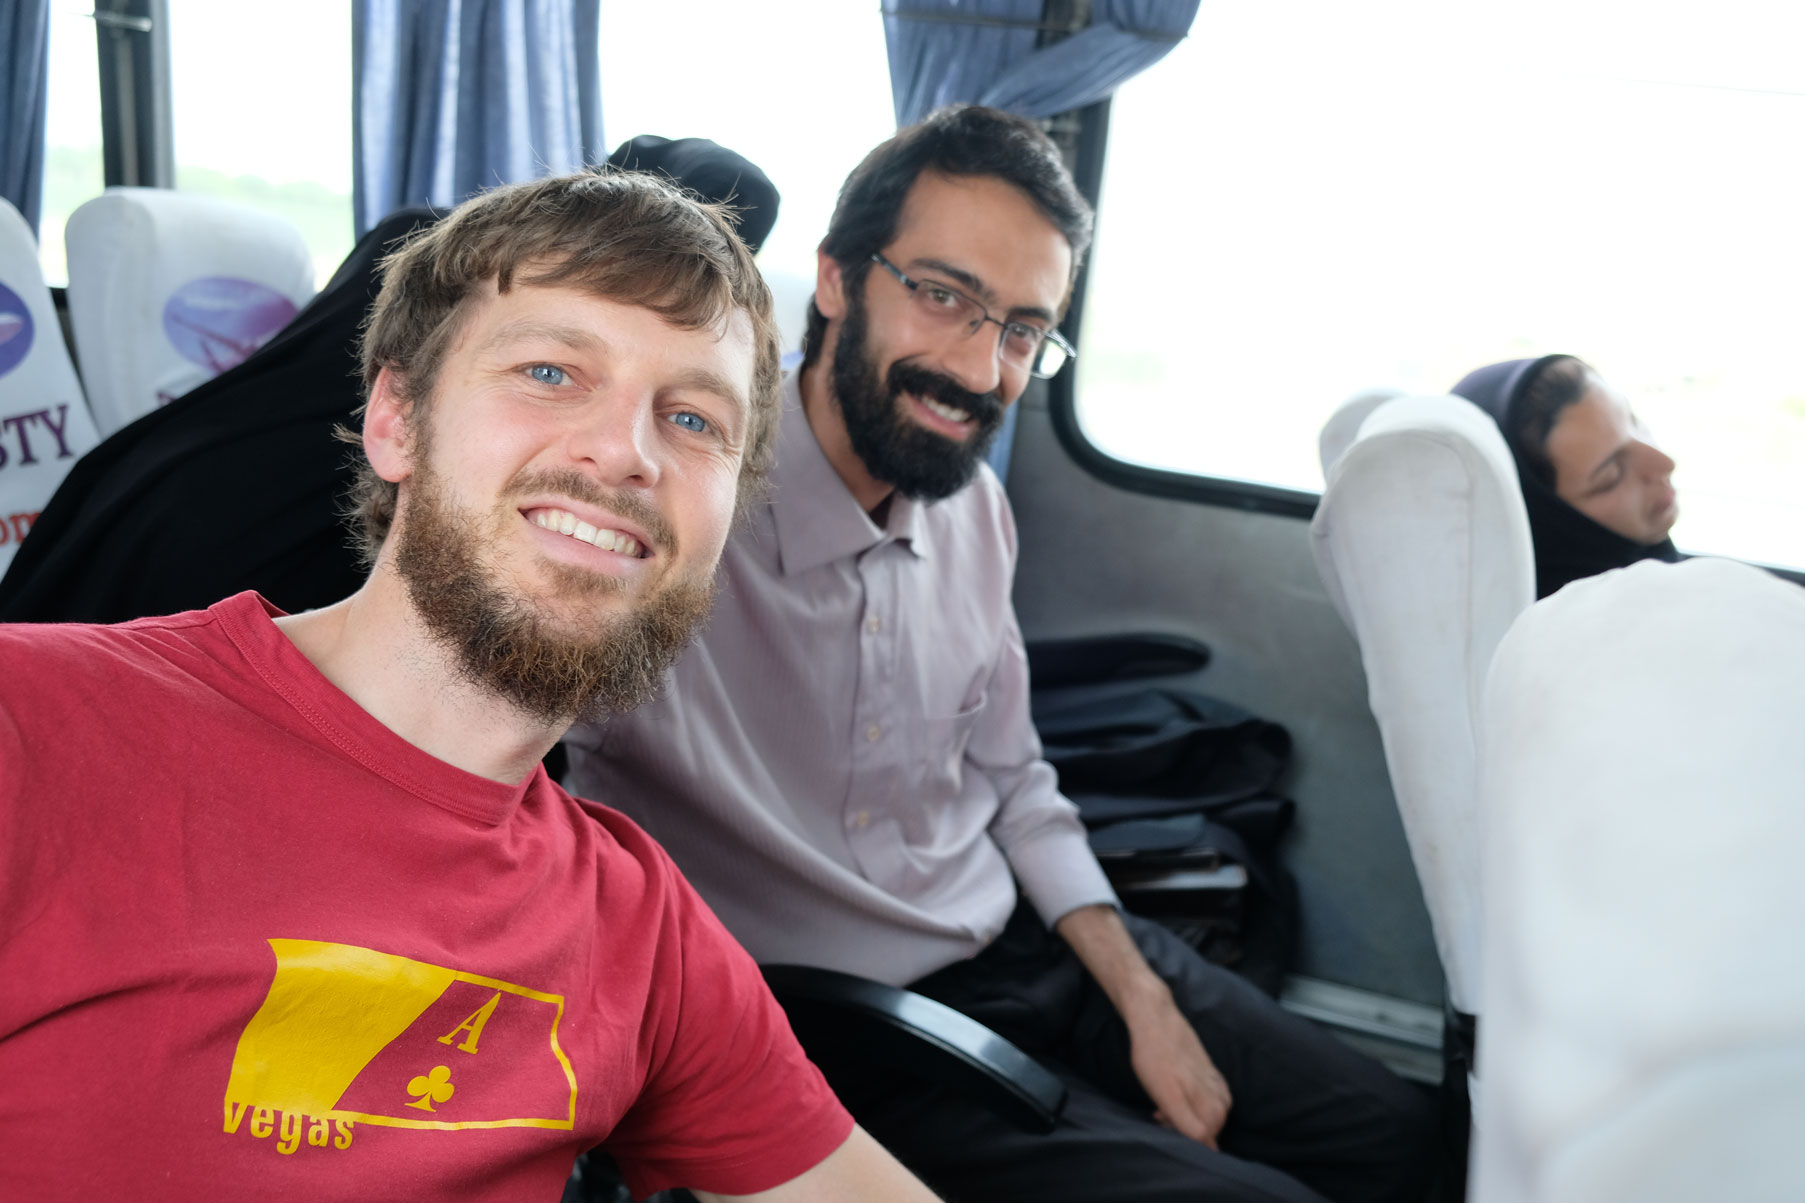 Sebastian neben einem Mann imn Bus